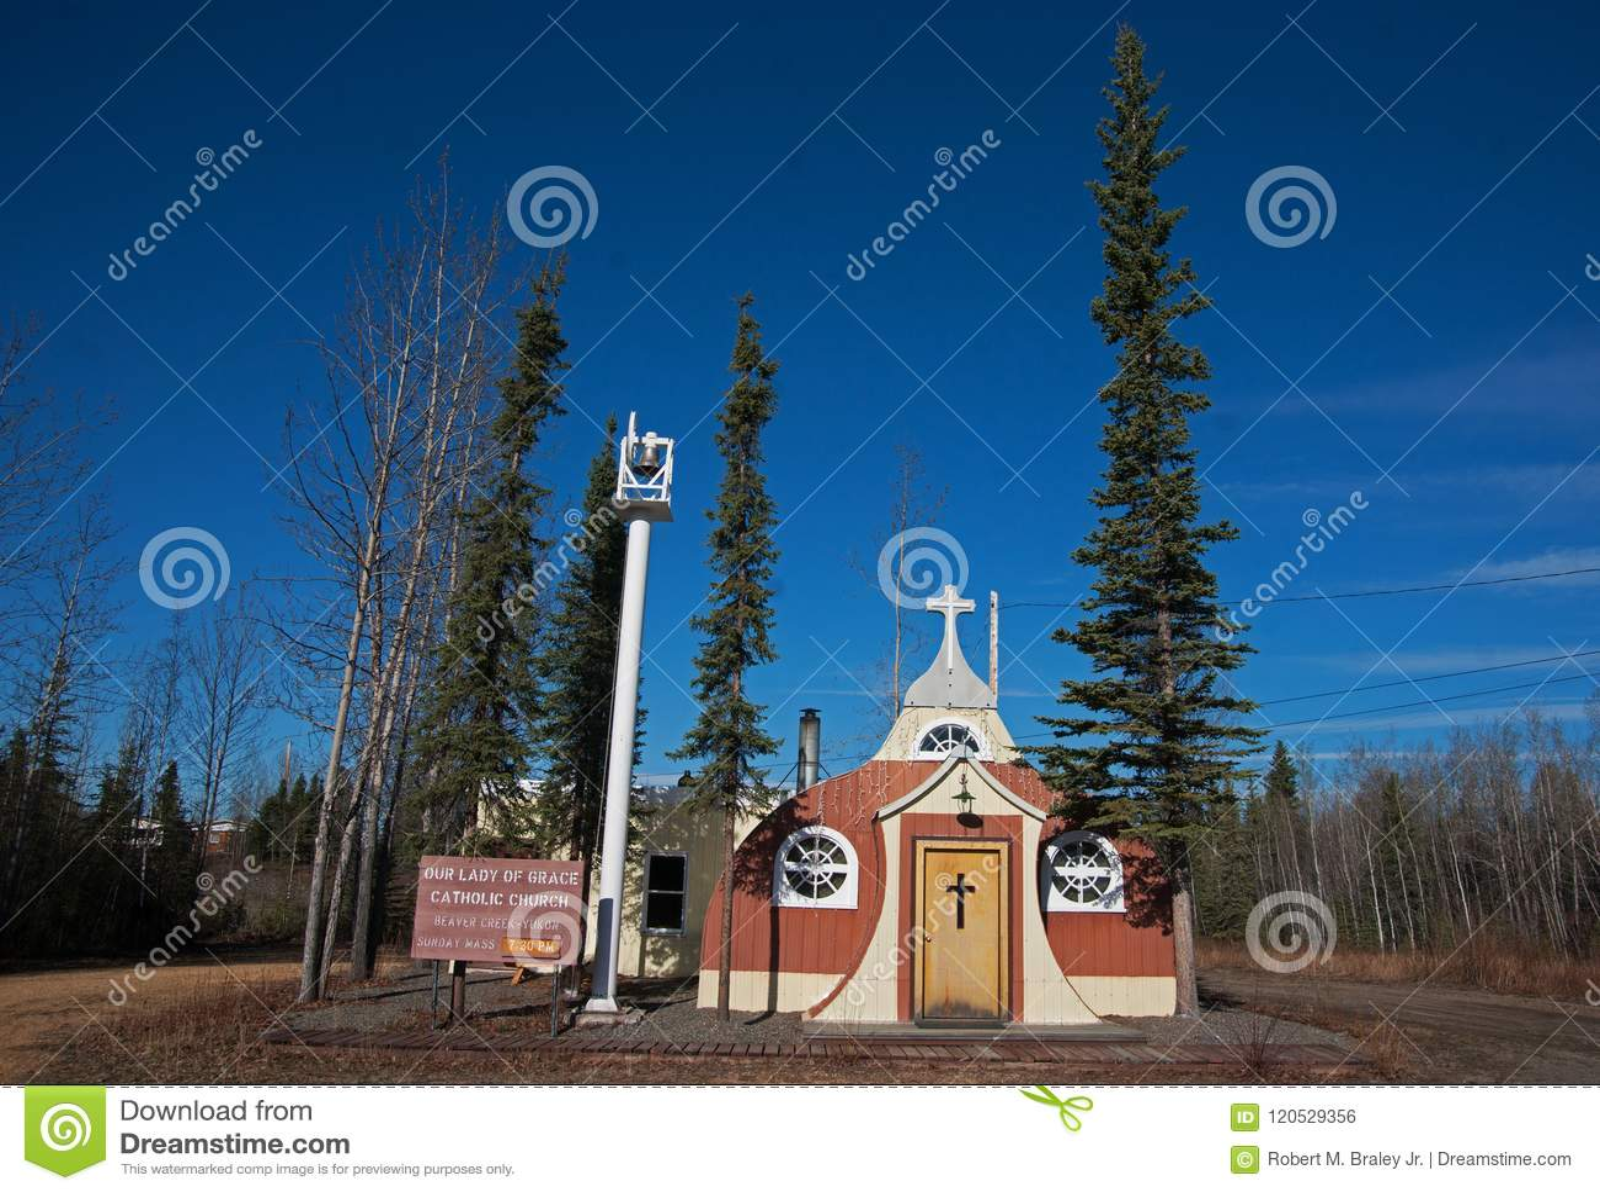 Vintage Catholic Church Beaver Creek Canada